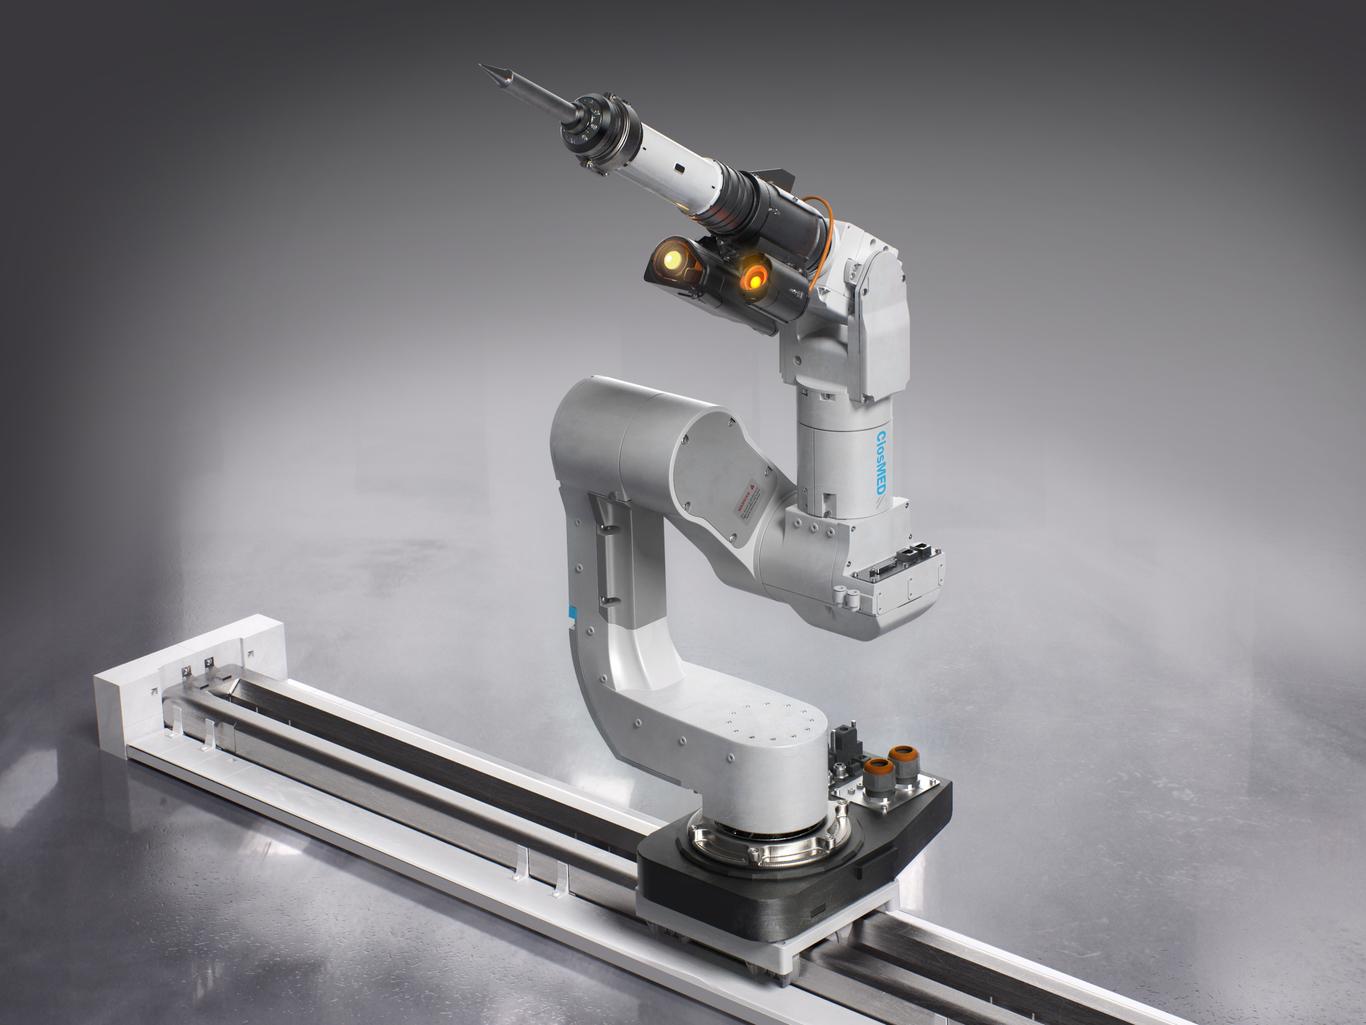 Vincenzobarkasy surgical arm concept 1 fb79f6cc rwmi